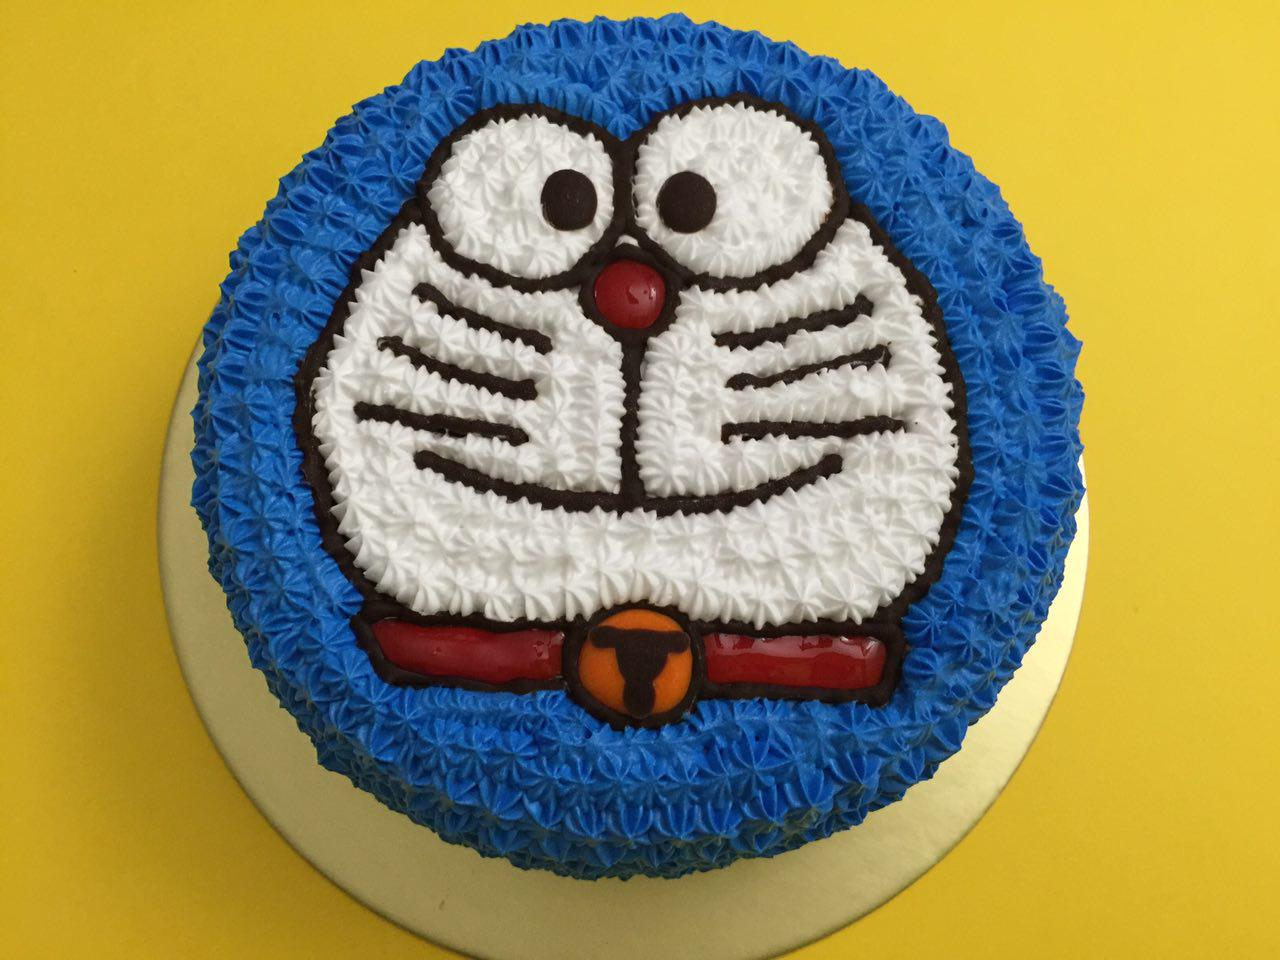 Doraemon Smiling Cake